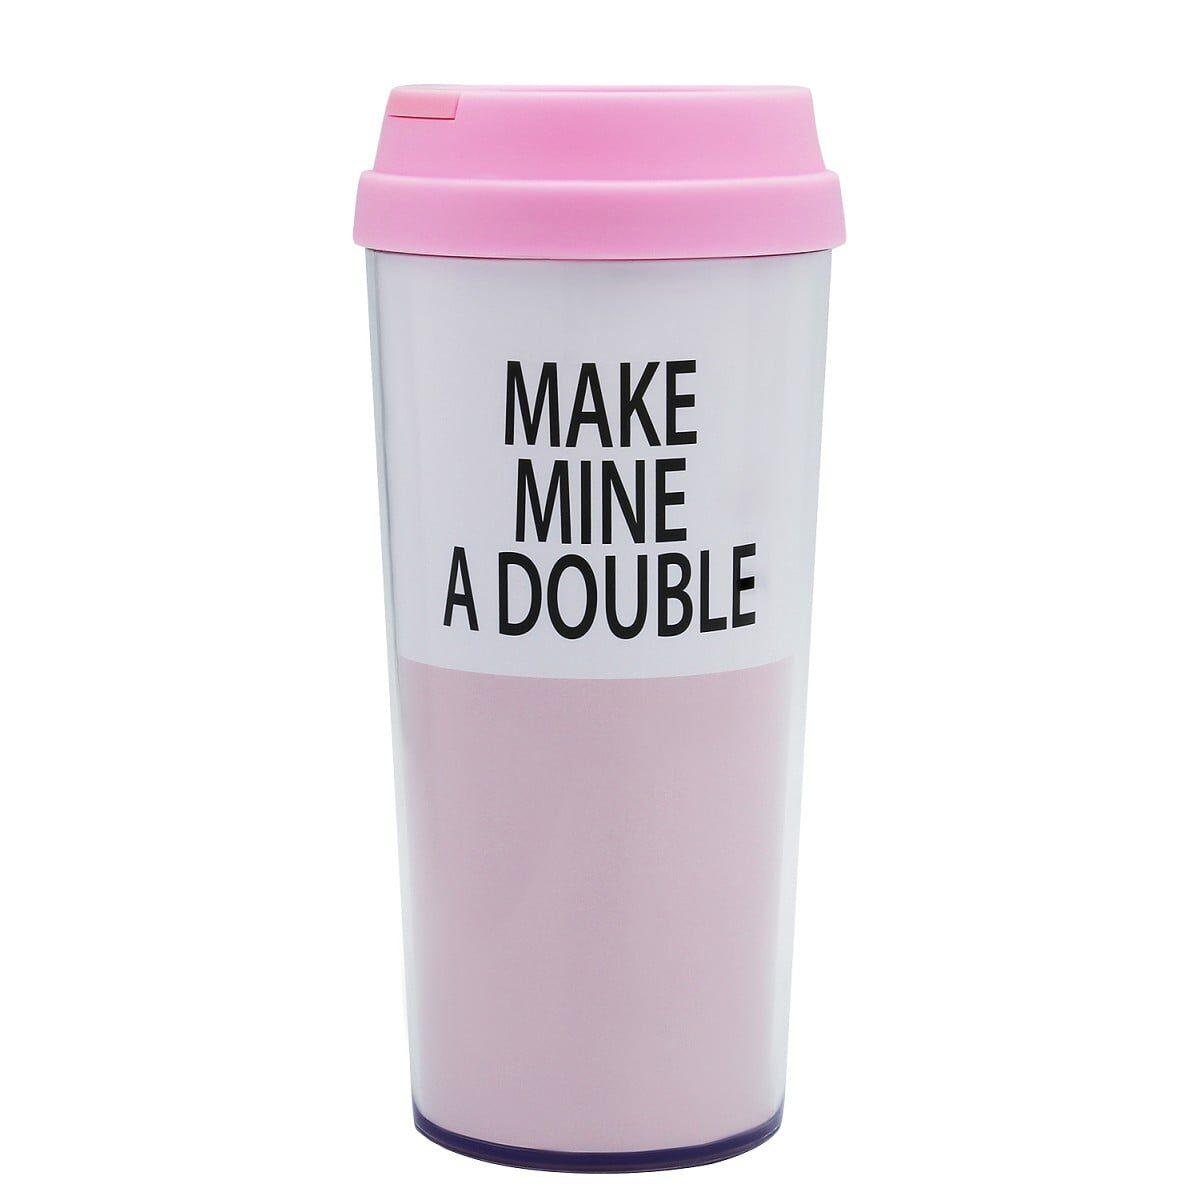 Tермостакан для напоїв Make mine a double 450мл